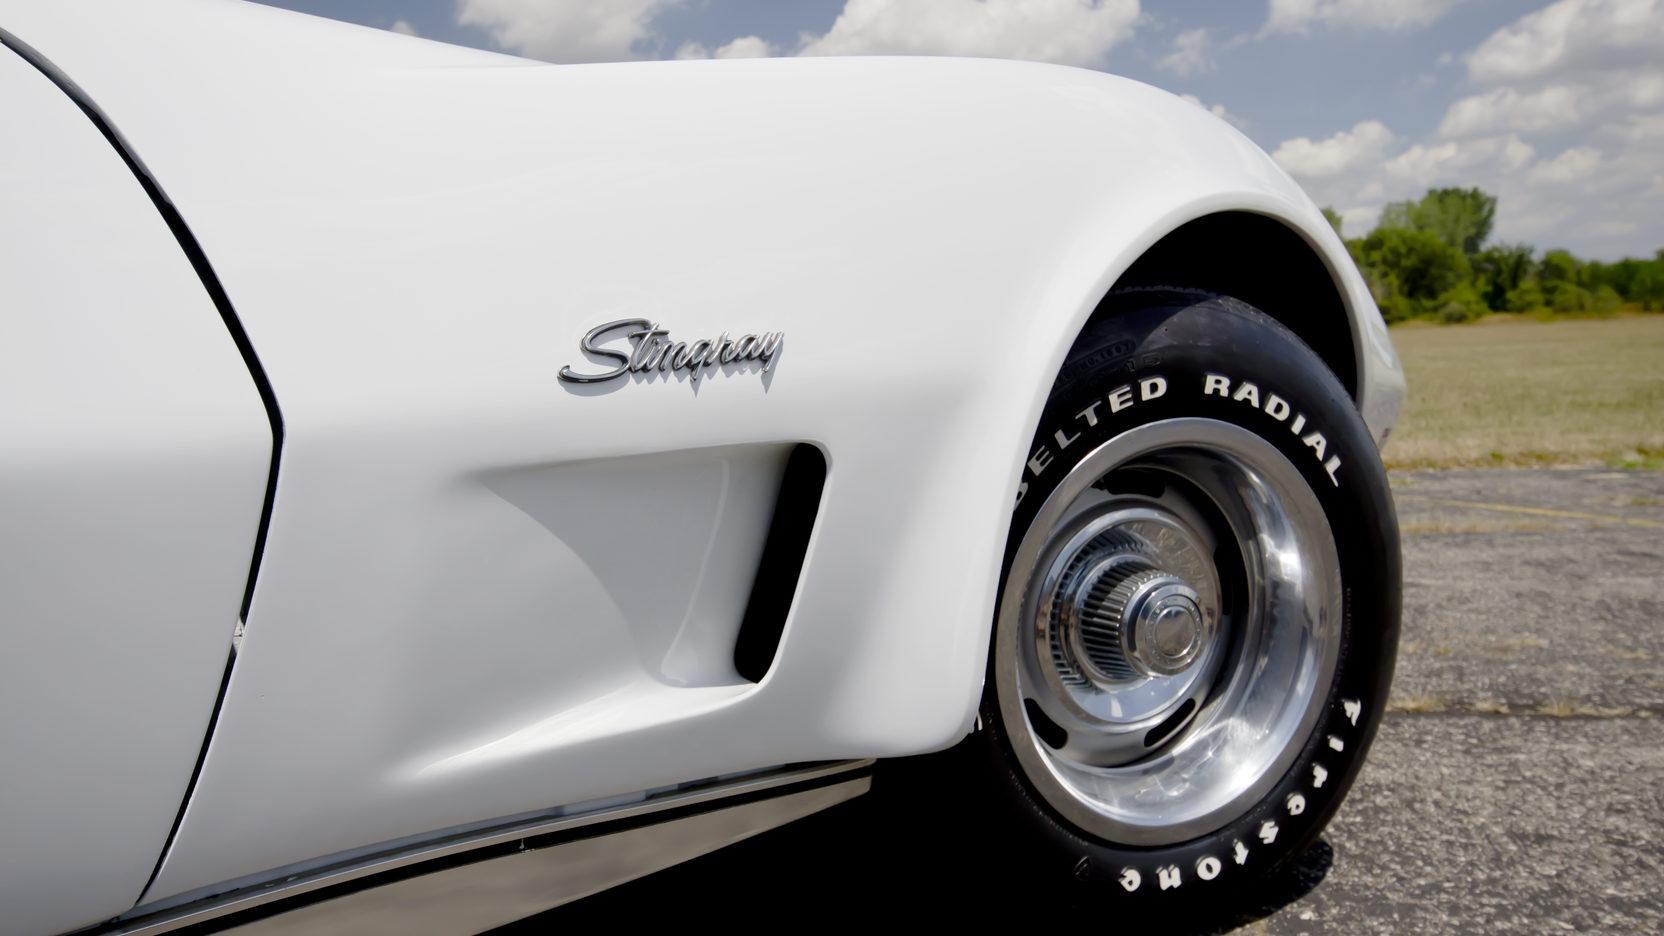 1976 Chevrolet Corvette front detail